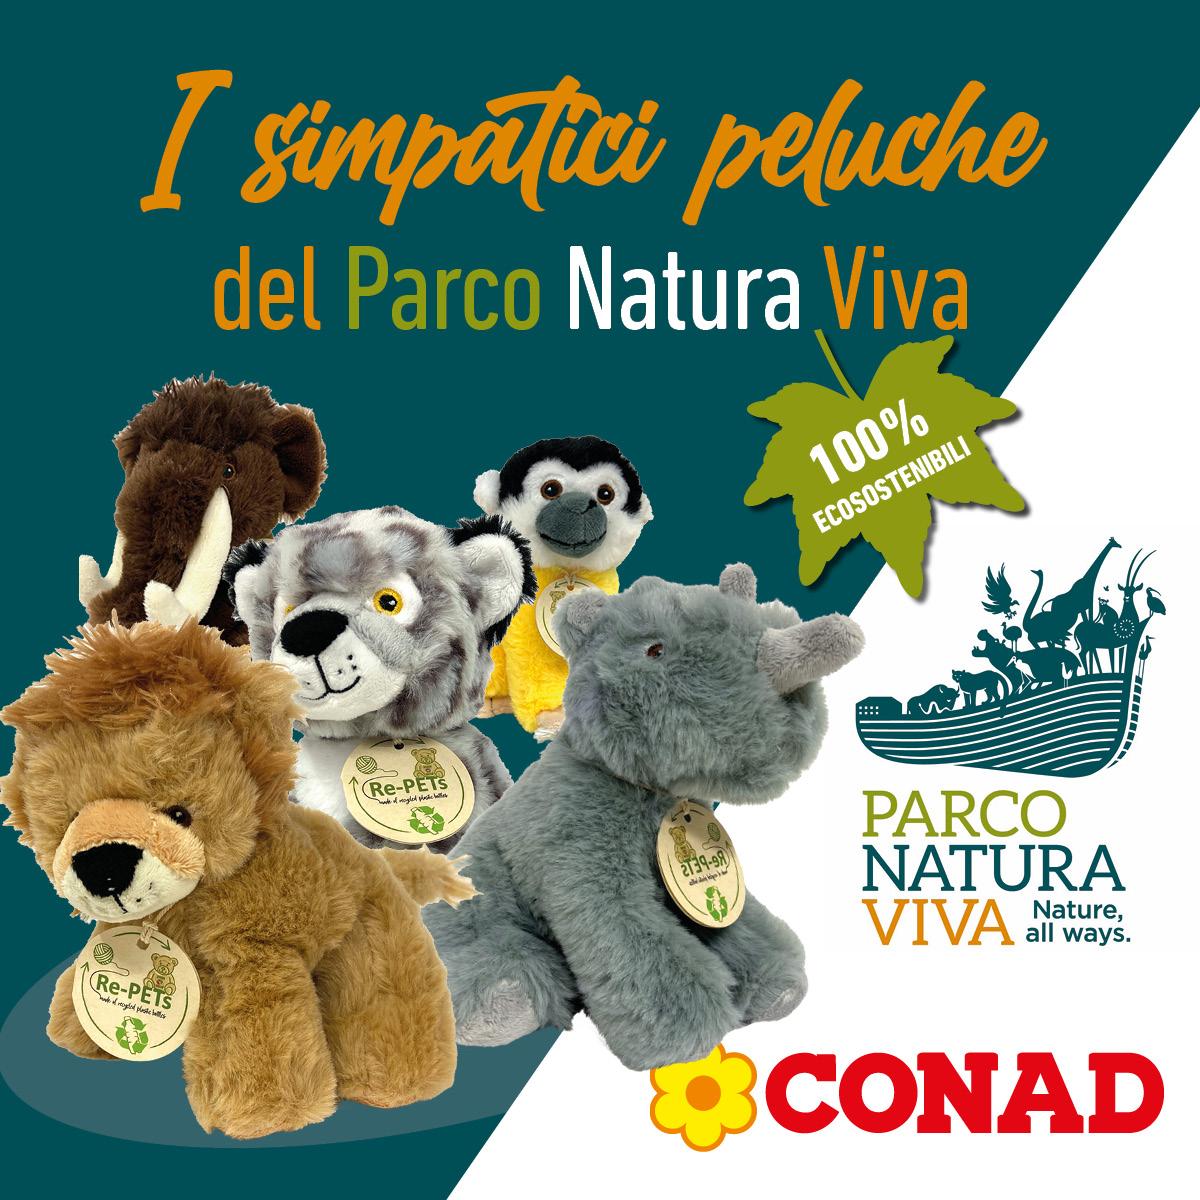 Parco Natura Viva gadget peluche DAO Conad